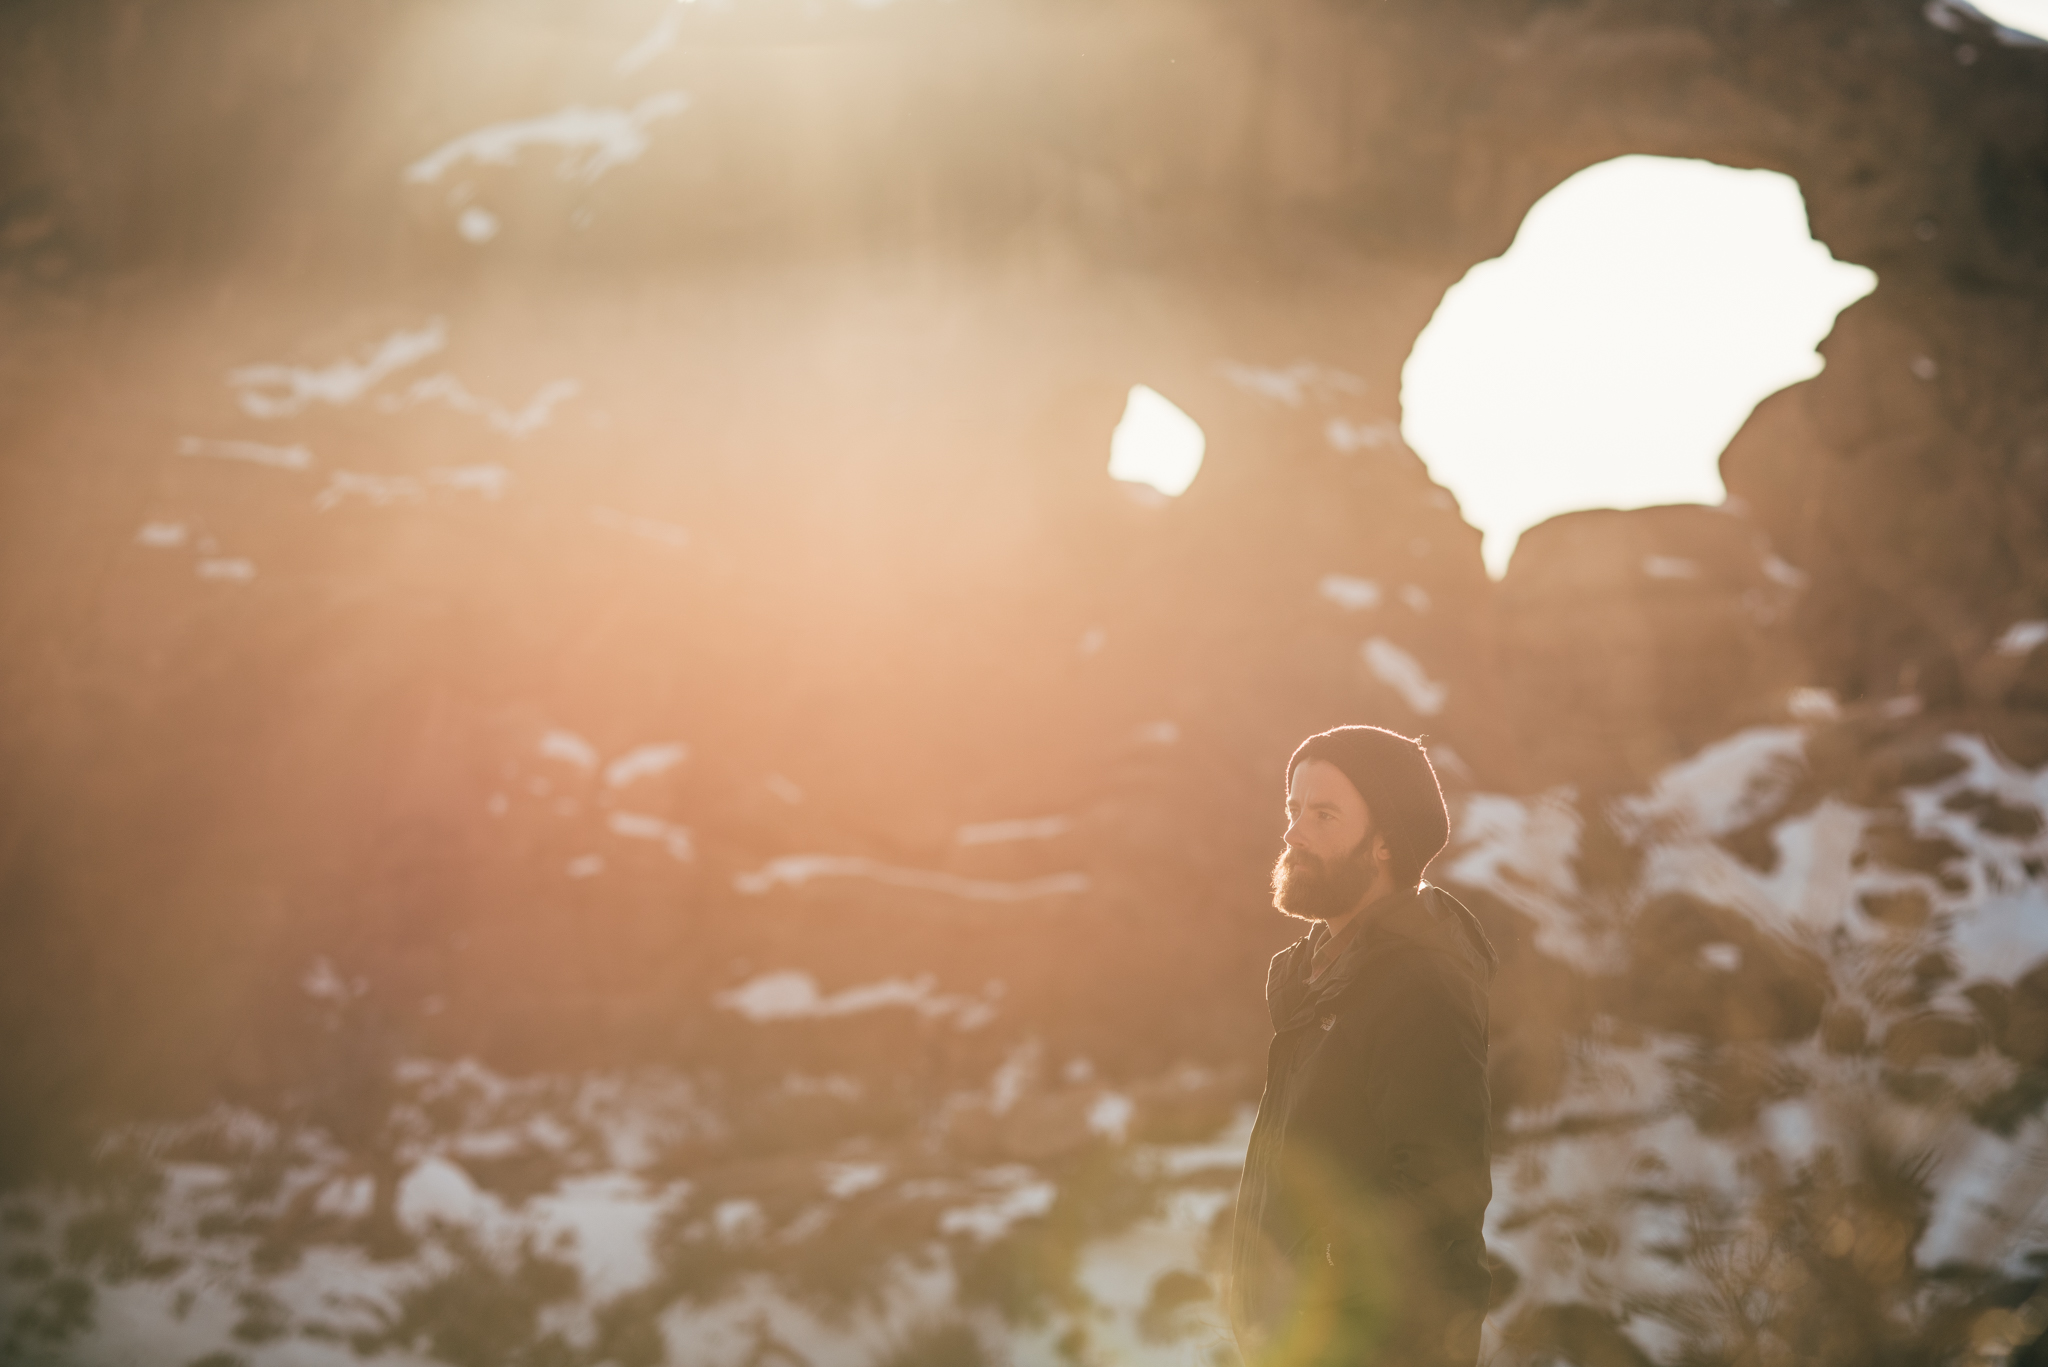 Isaiah-&-Taylor-Photography---White-Sand-Dunes-17.jpg